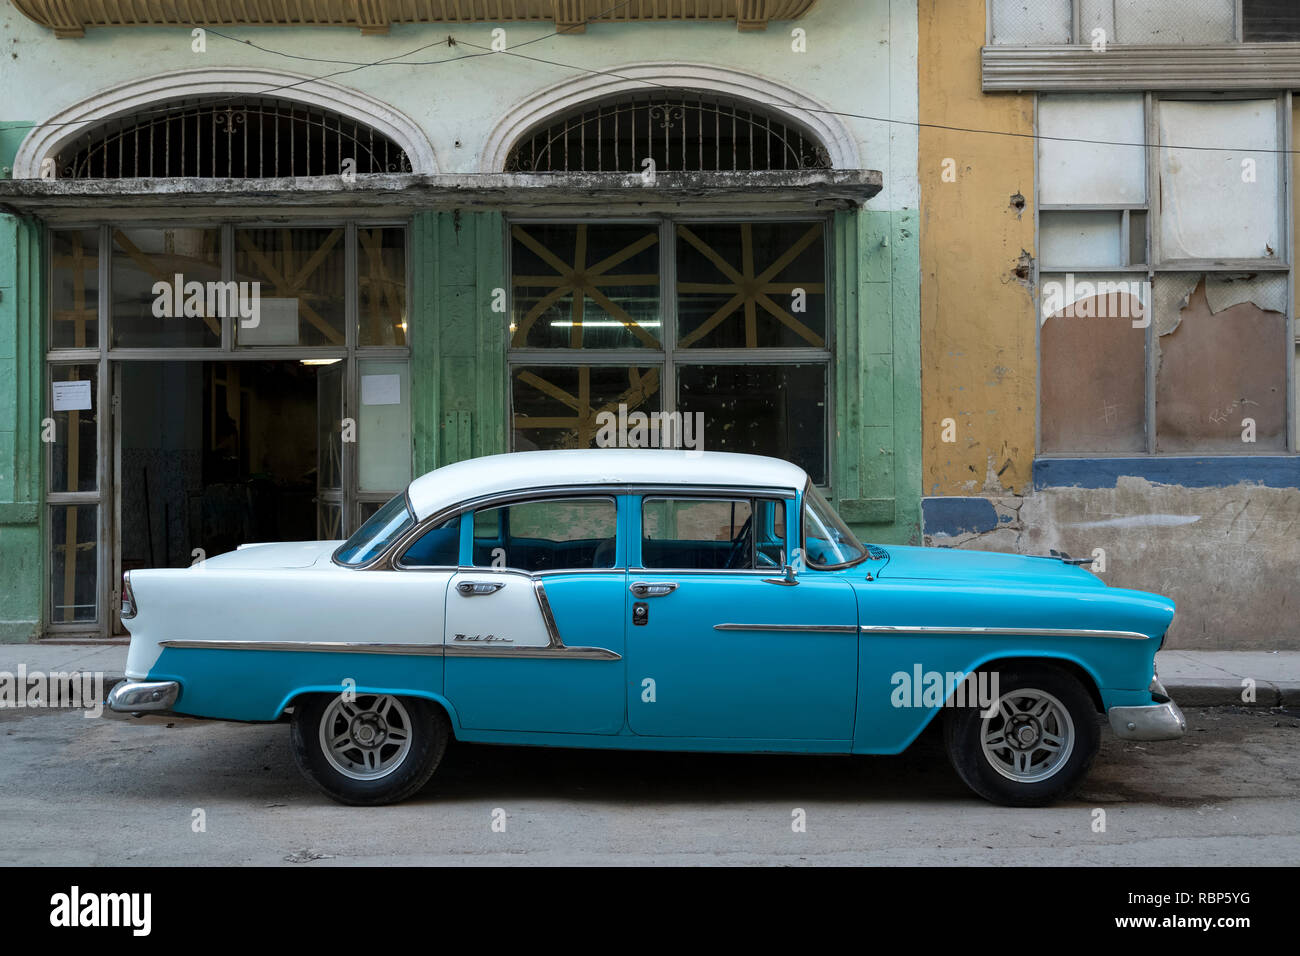 Kelebihan Chevrolet Bel Air 1955 Harga